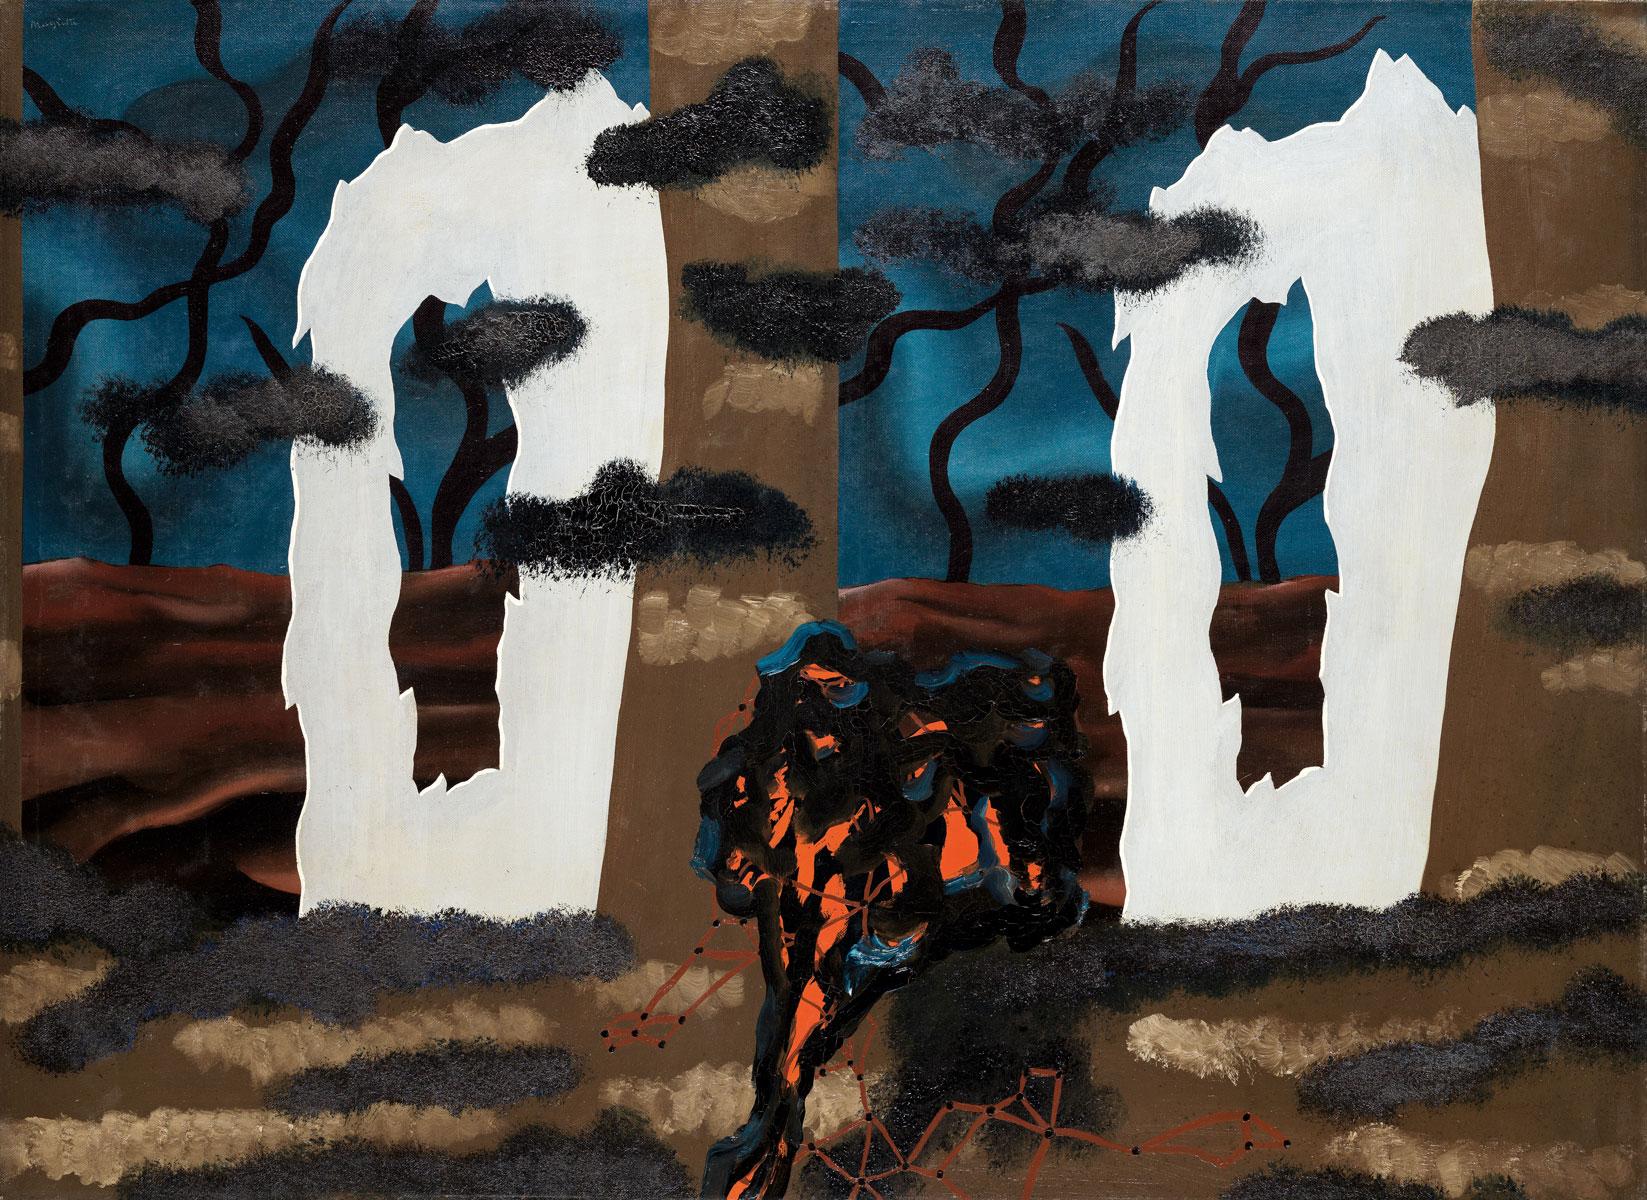 René Magritte, Le Goût de L'invisible, 1927, 73,5×100 cm; Staatliche Kunsthalle Karlsruhe © SKK / VG Bild-Kunst, Bonn 2016 / Foto: Fischer/Kohler